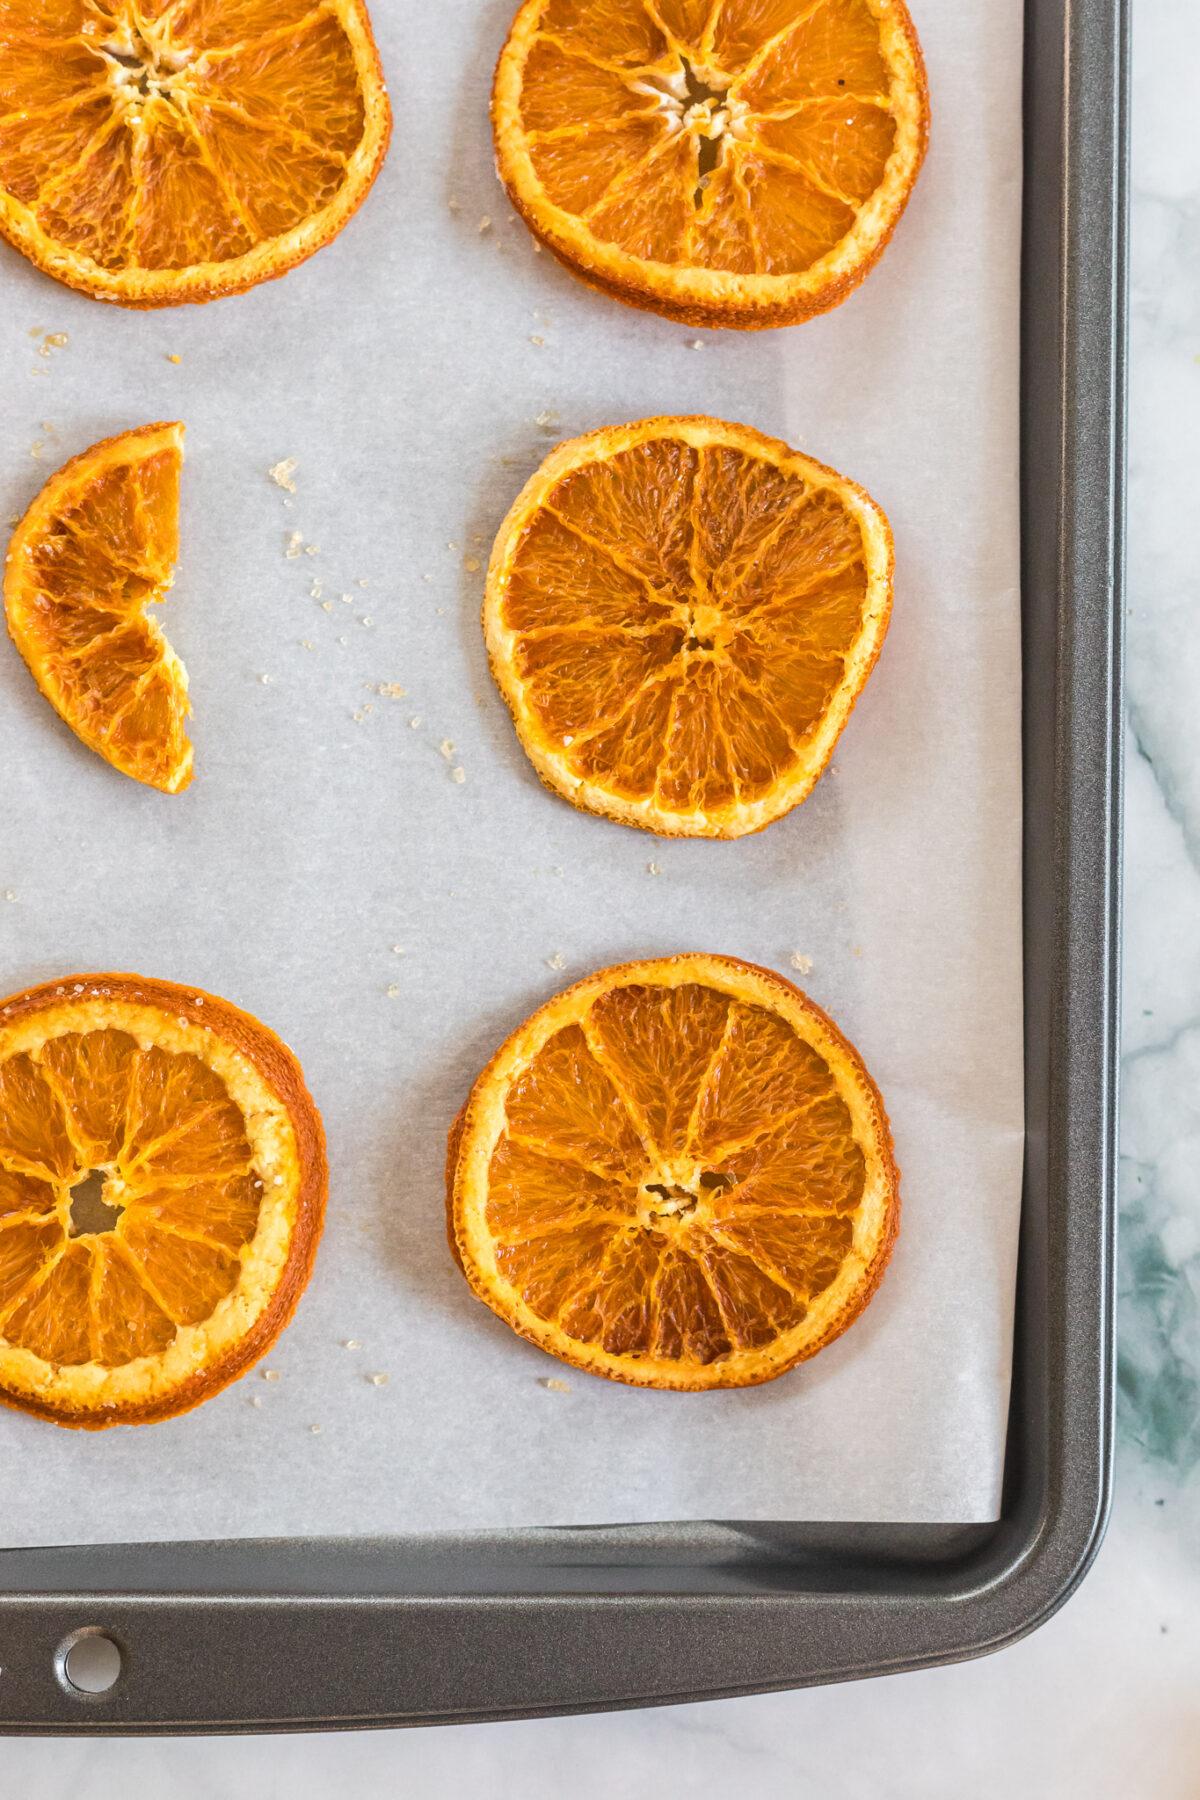 Dried orange slices on baking sheet